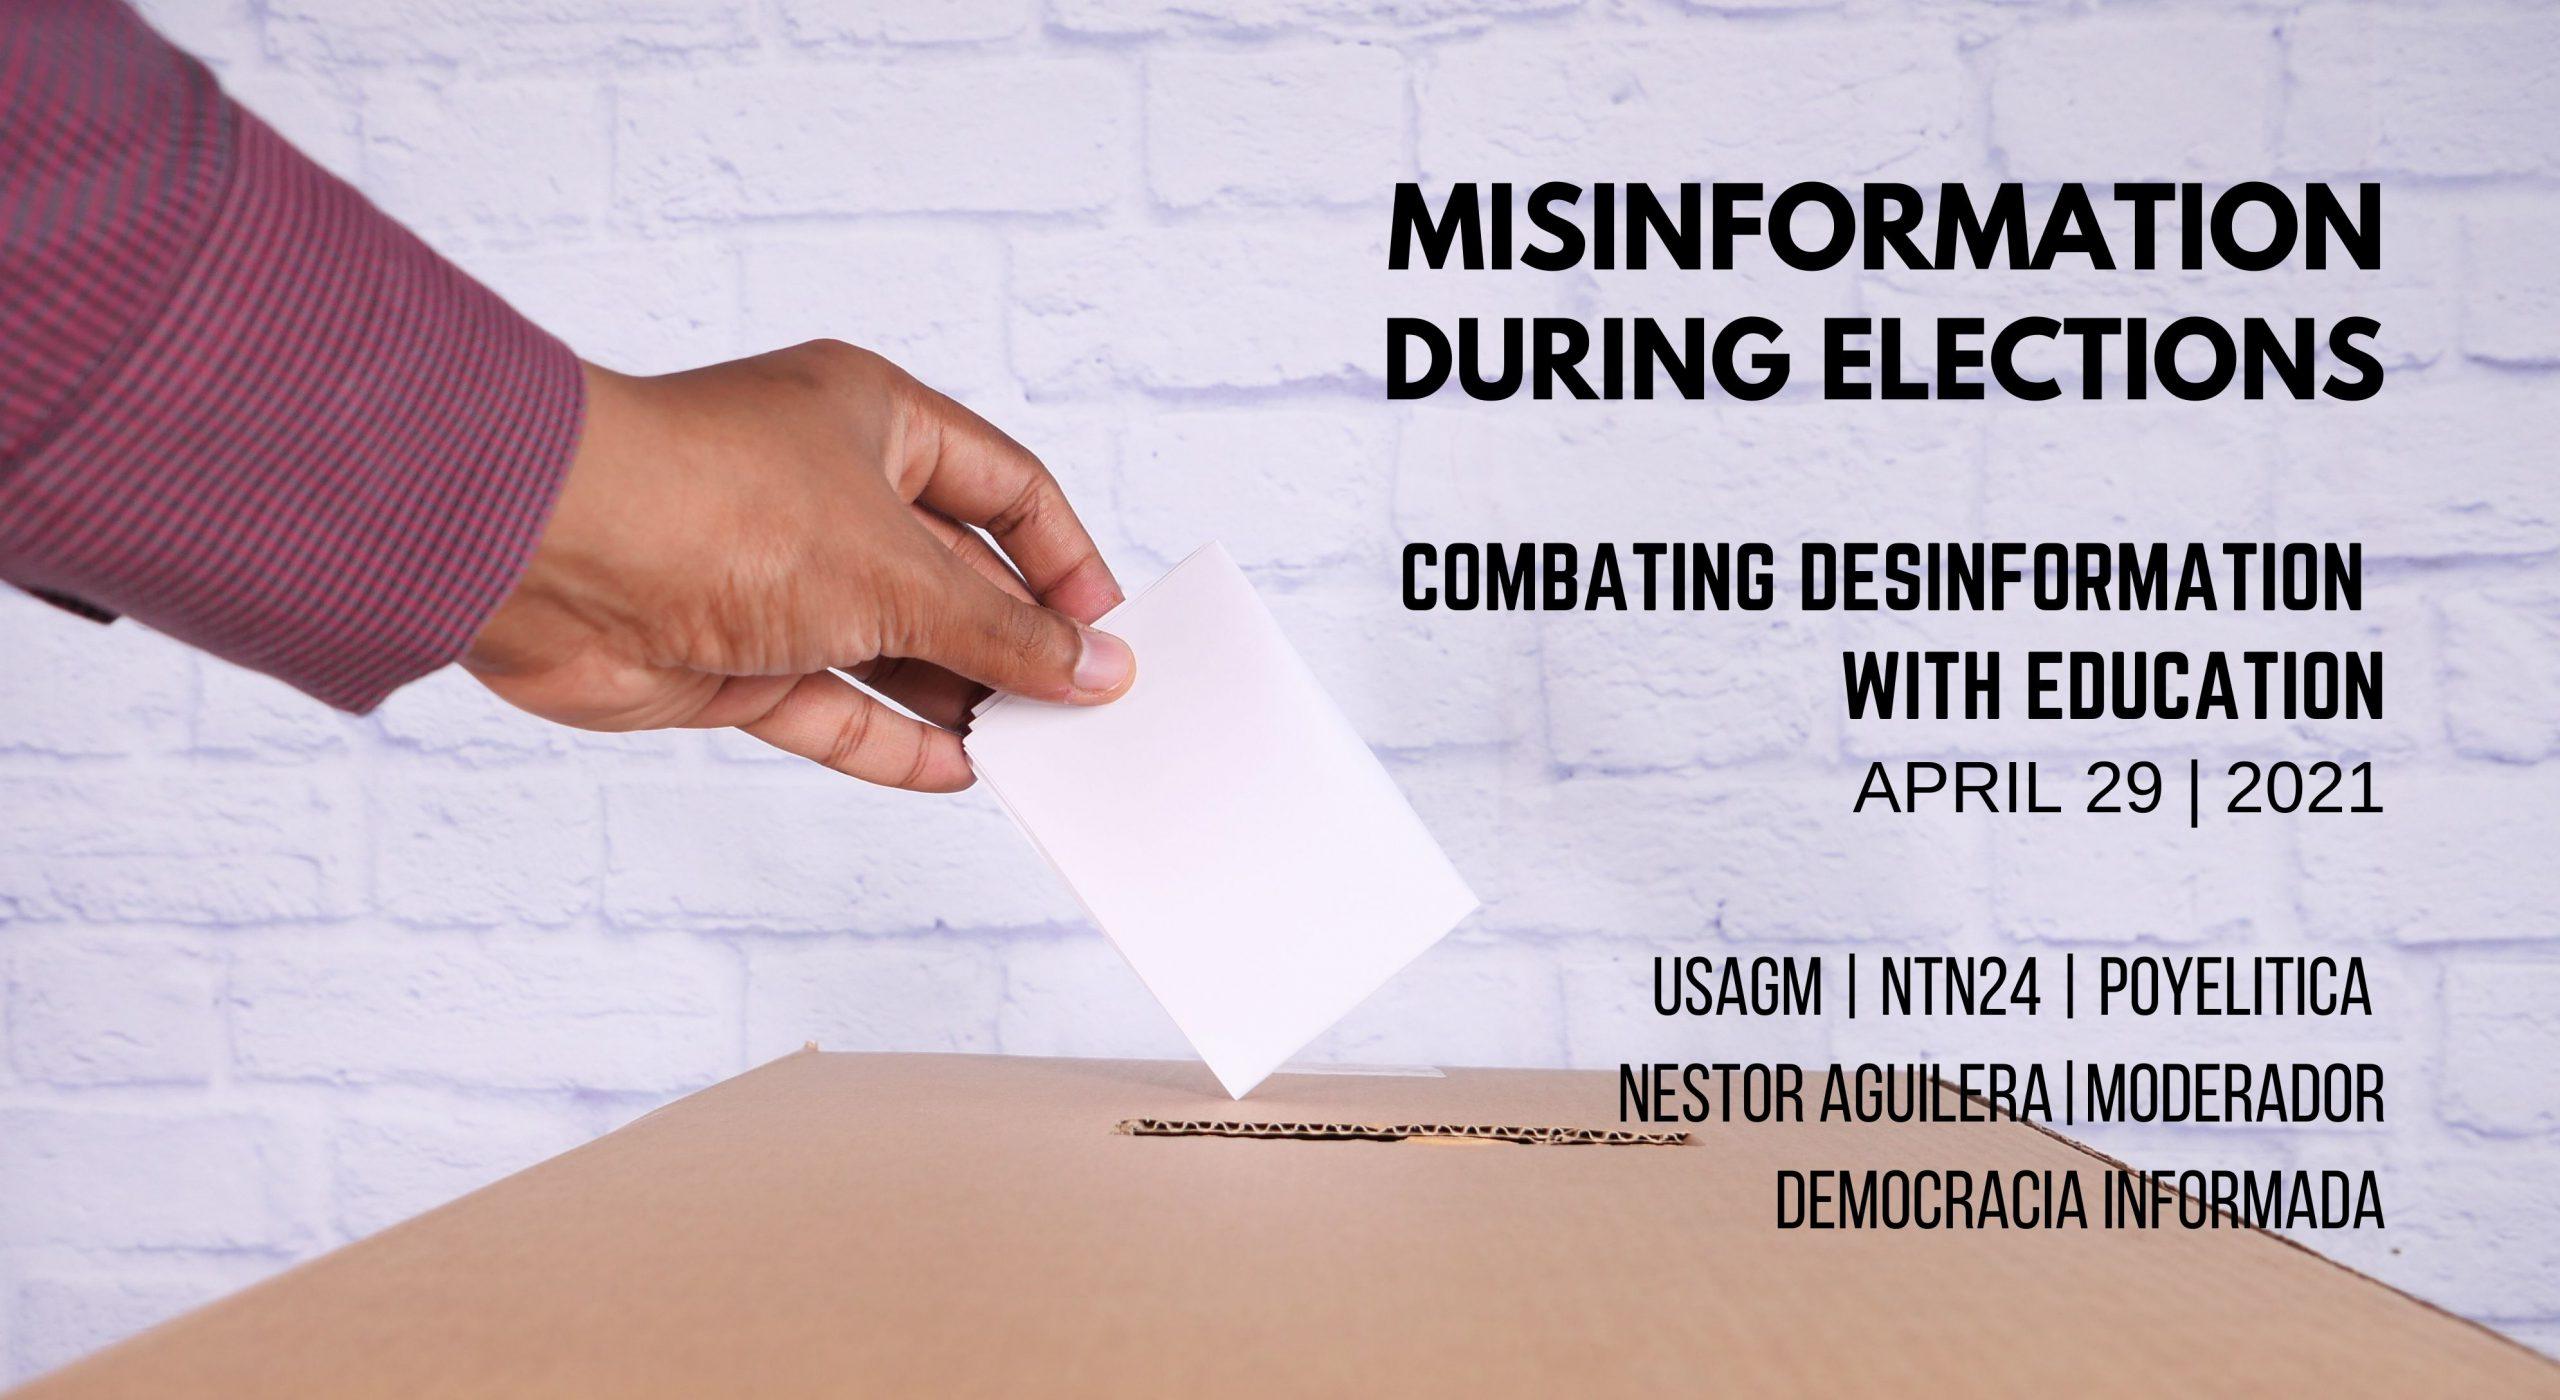 Ecuador: Misinformation during elections